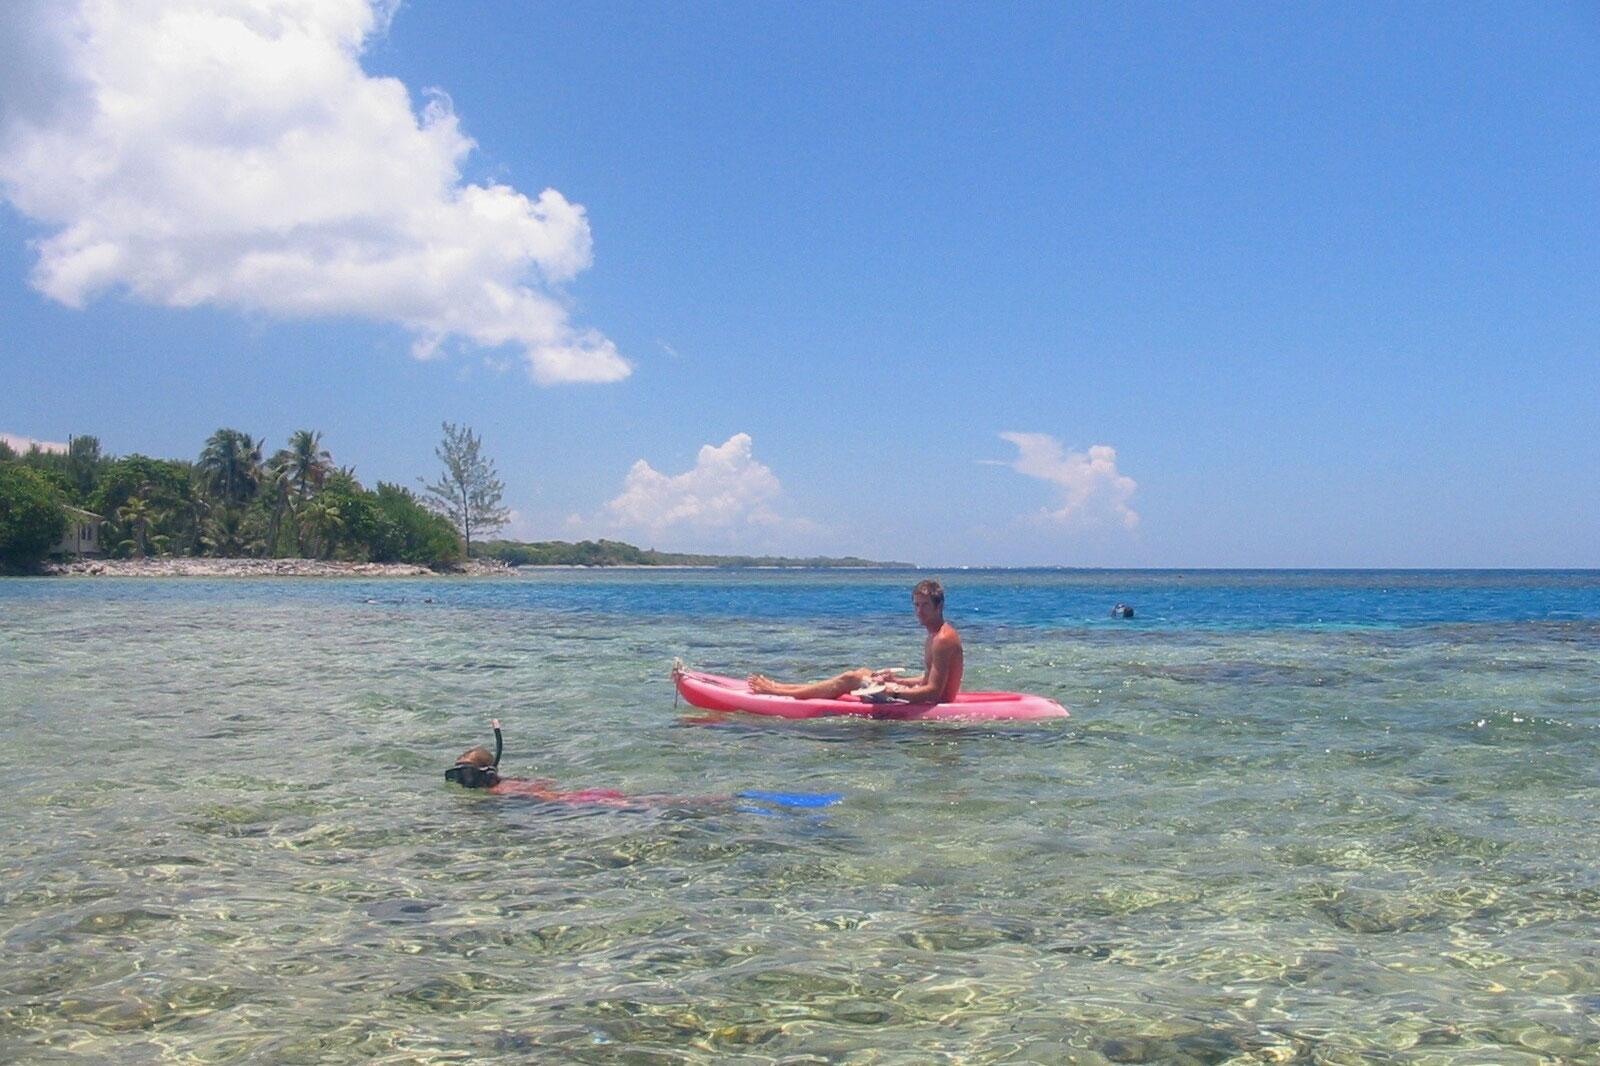 Kayak Rental with Snorkeling